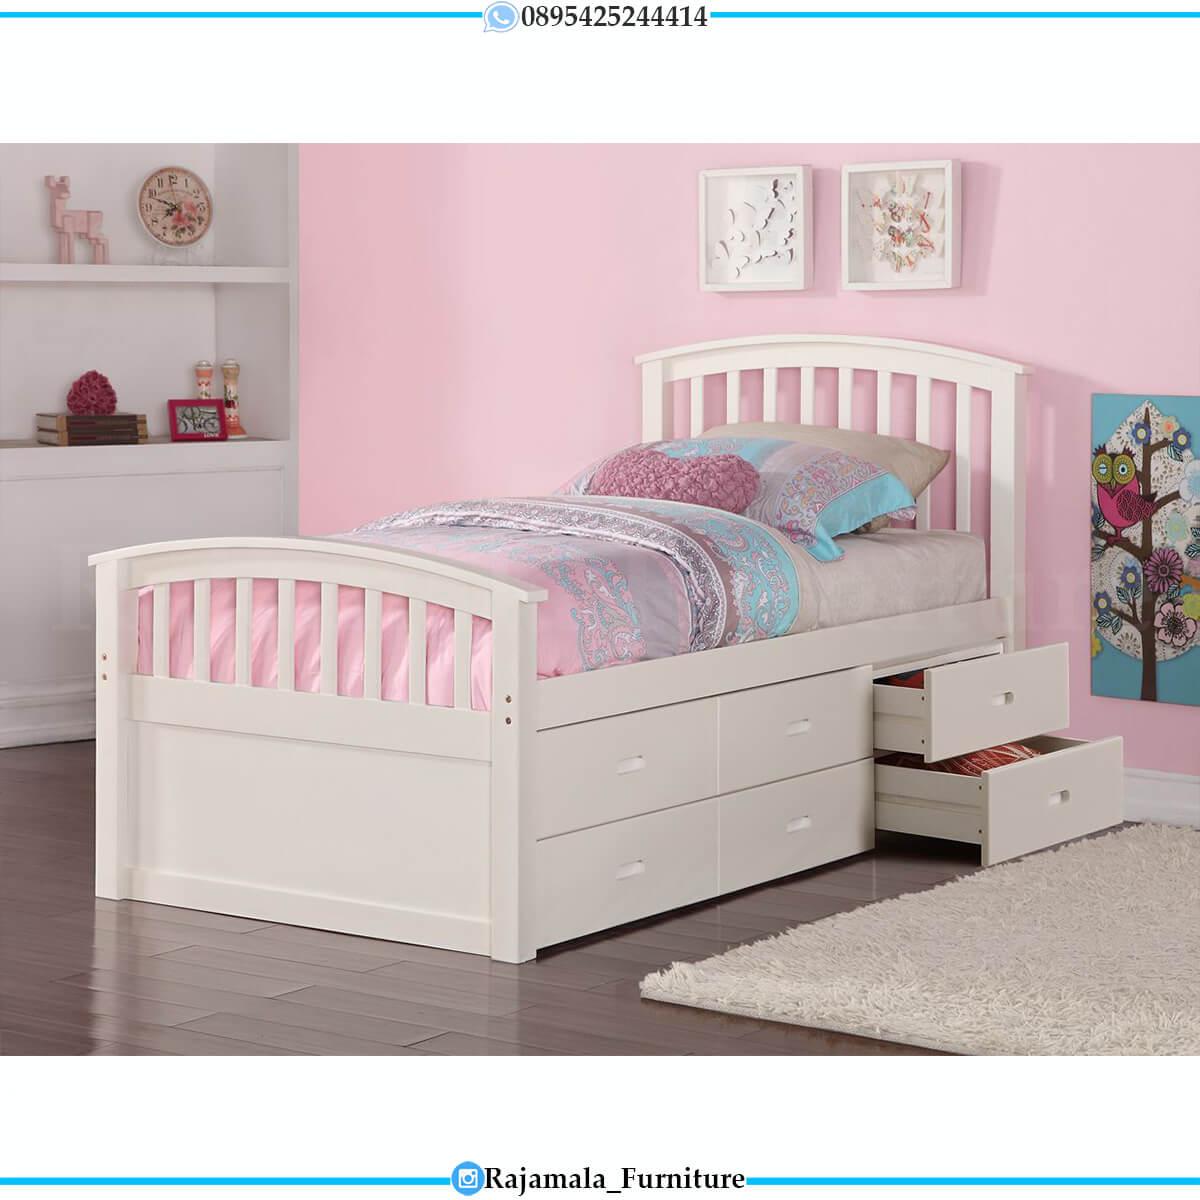 Promo Tempat Tidur Anak Jepara Special Ramadhan Mebel Jepara RM-0637